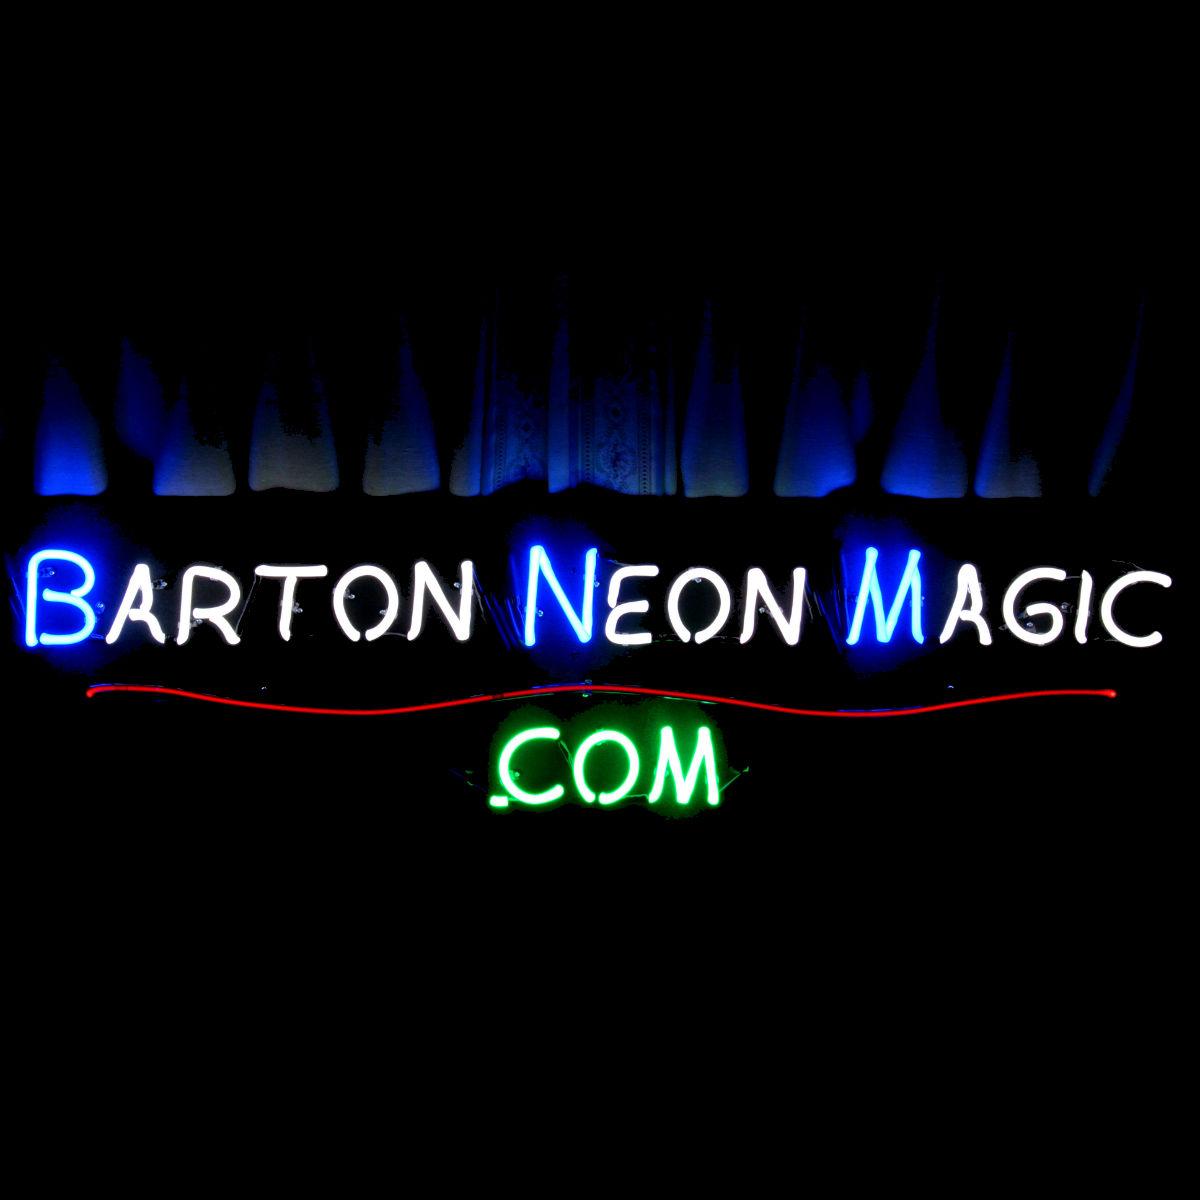 BartonNeonMagic.com - Stunning Custom Neon Artworks, Sculptures, and Chandeliers by John Barton - Famous USA Neon Light Sculptor